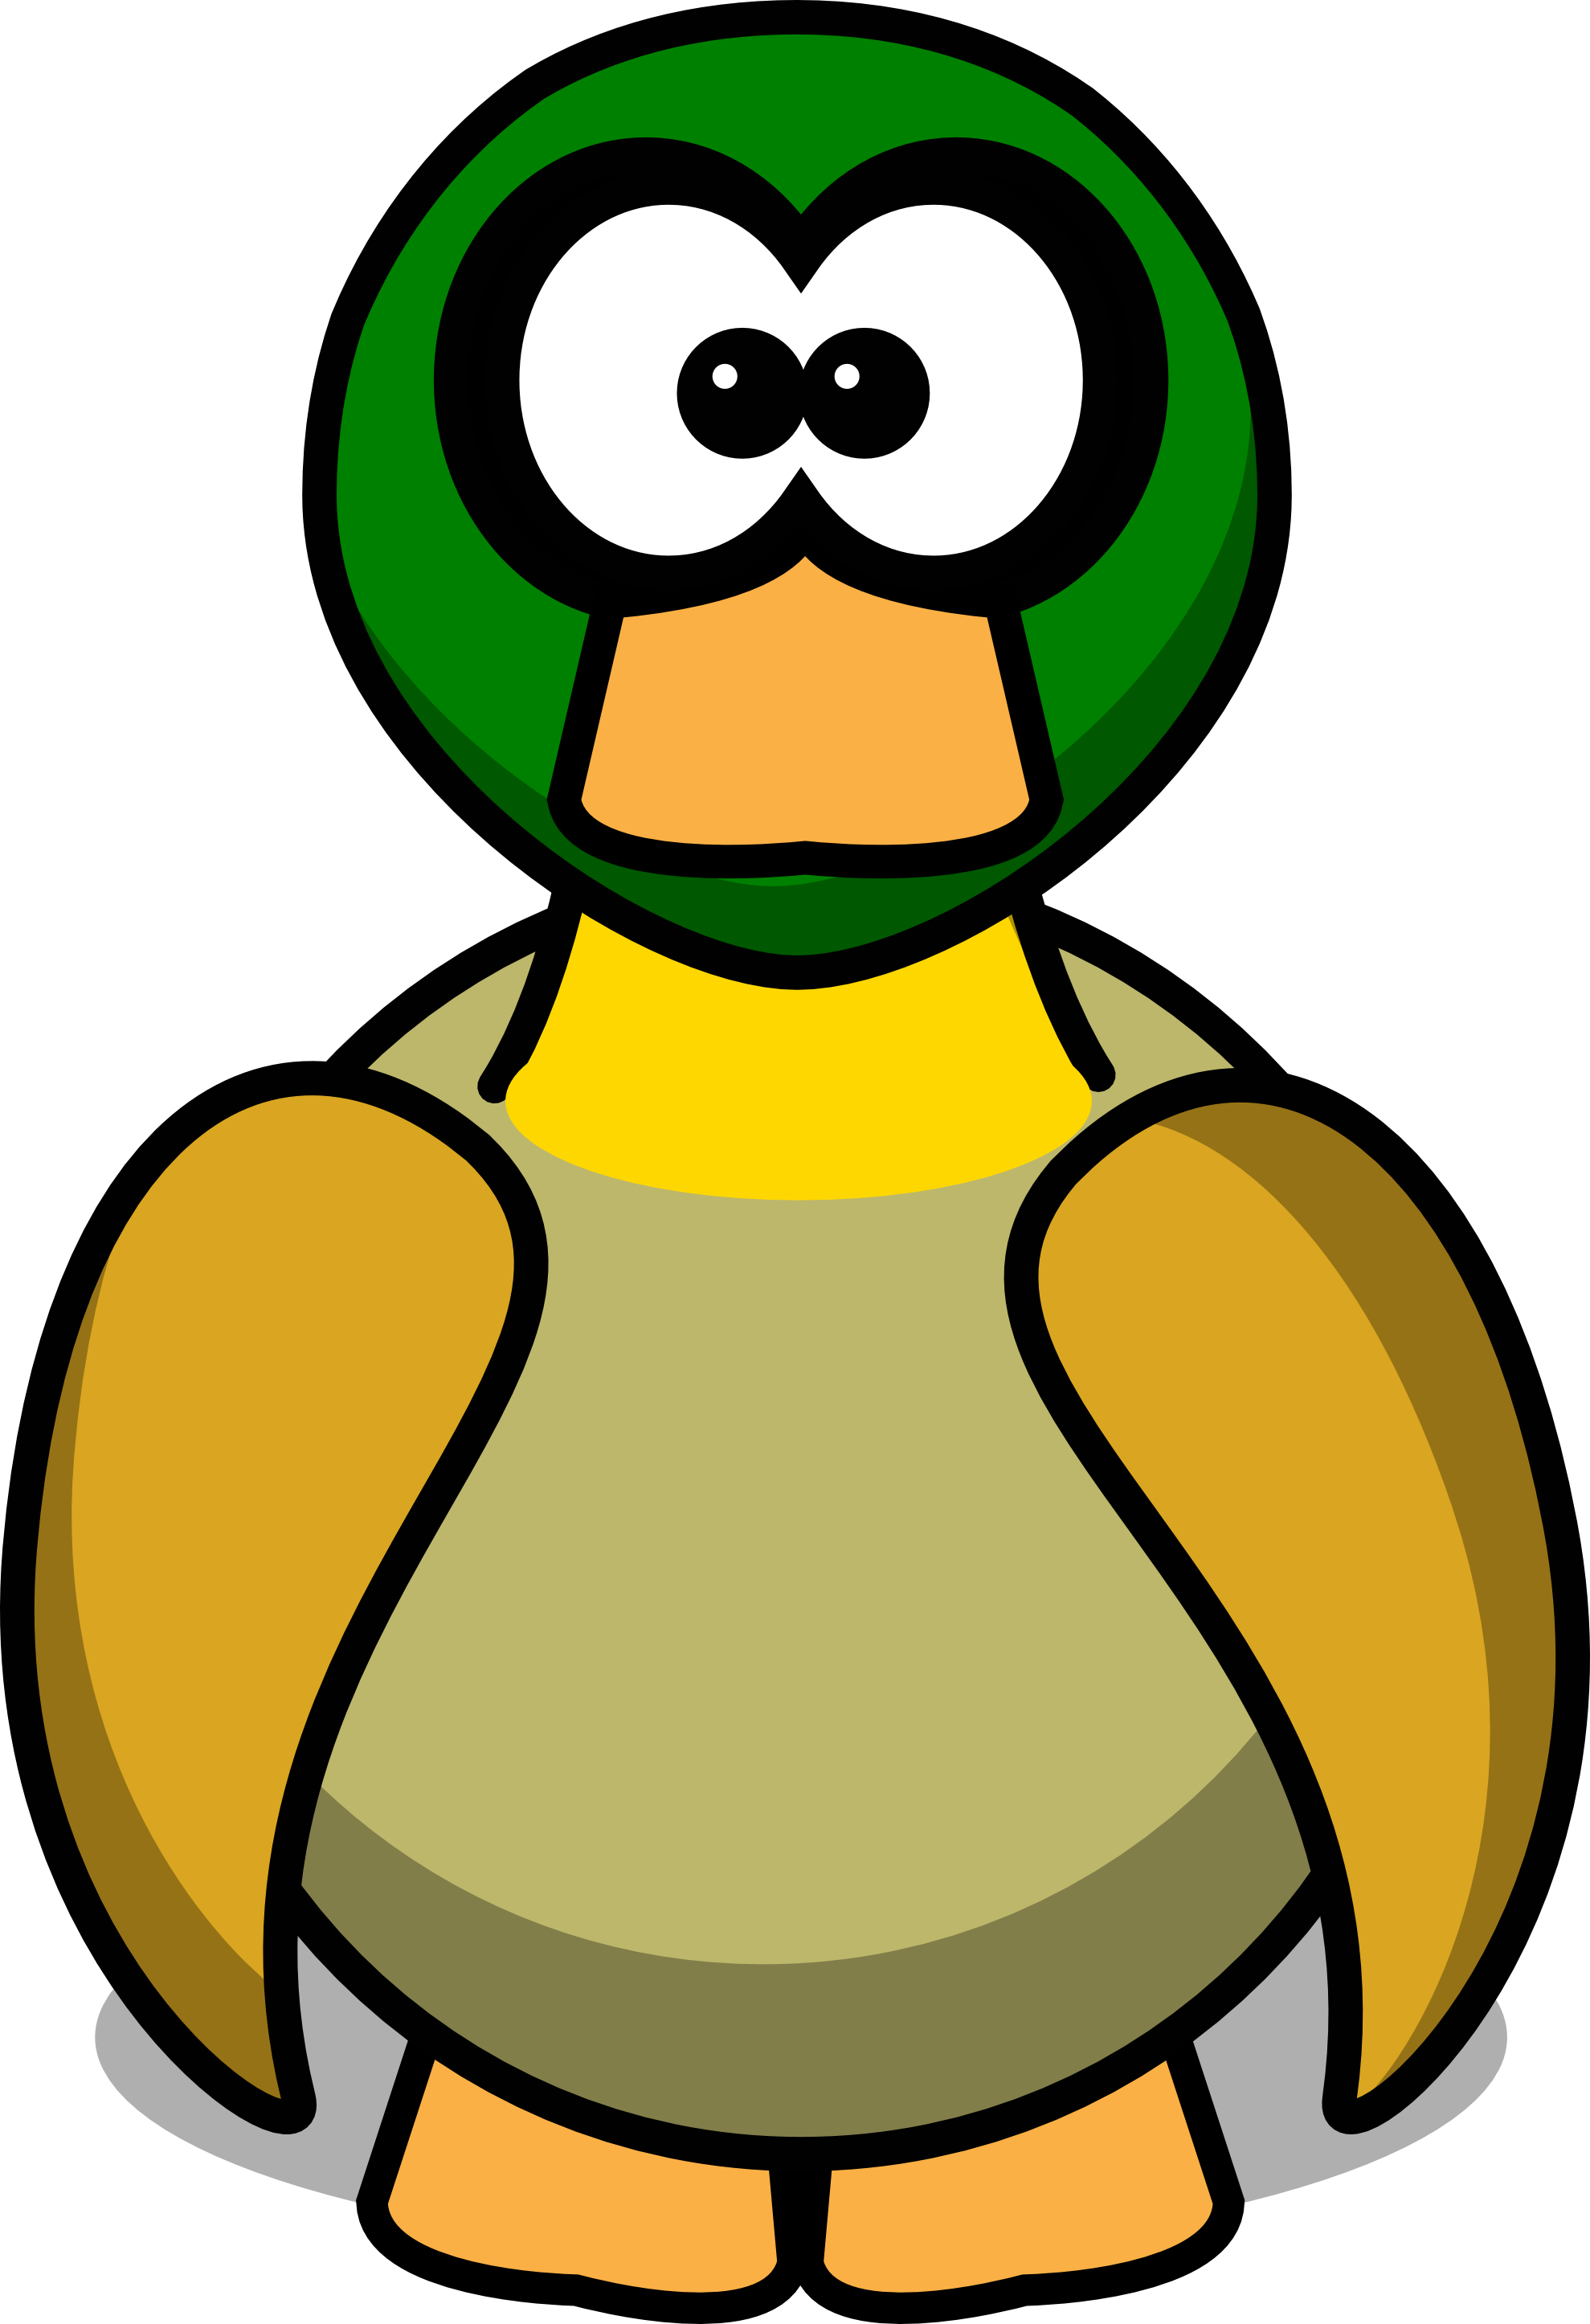 Duck Images Cartoon - ClipArt Best - 281.6KB